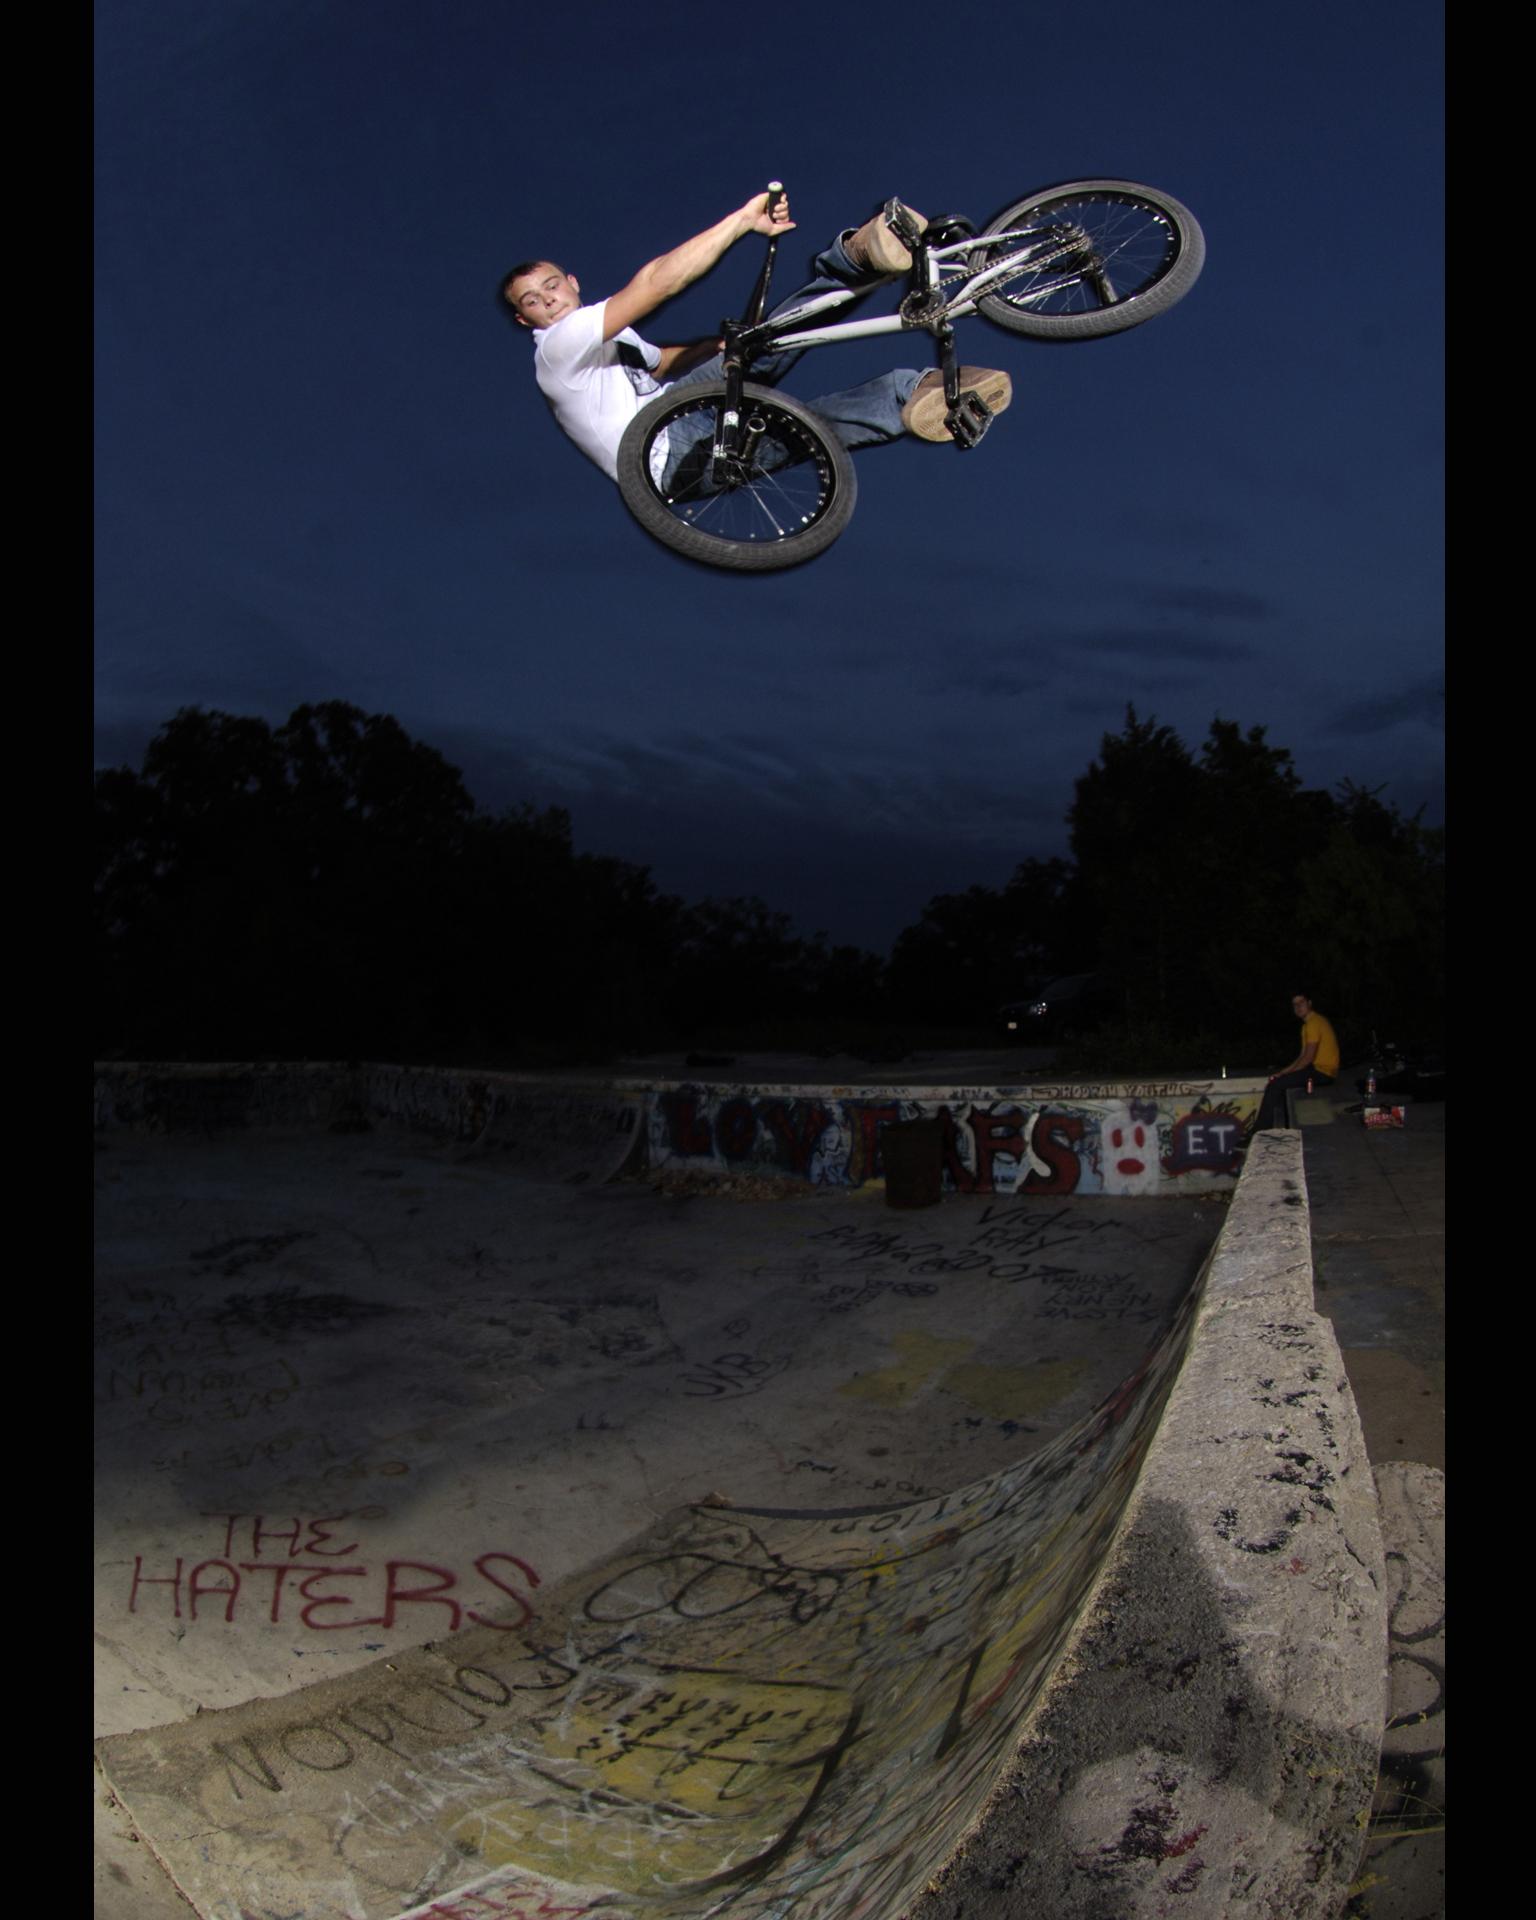 Matt Roe, Bastrop, Texas